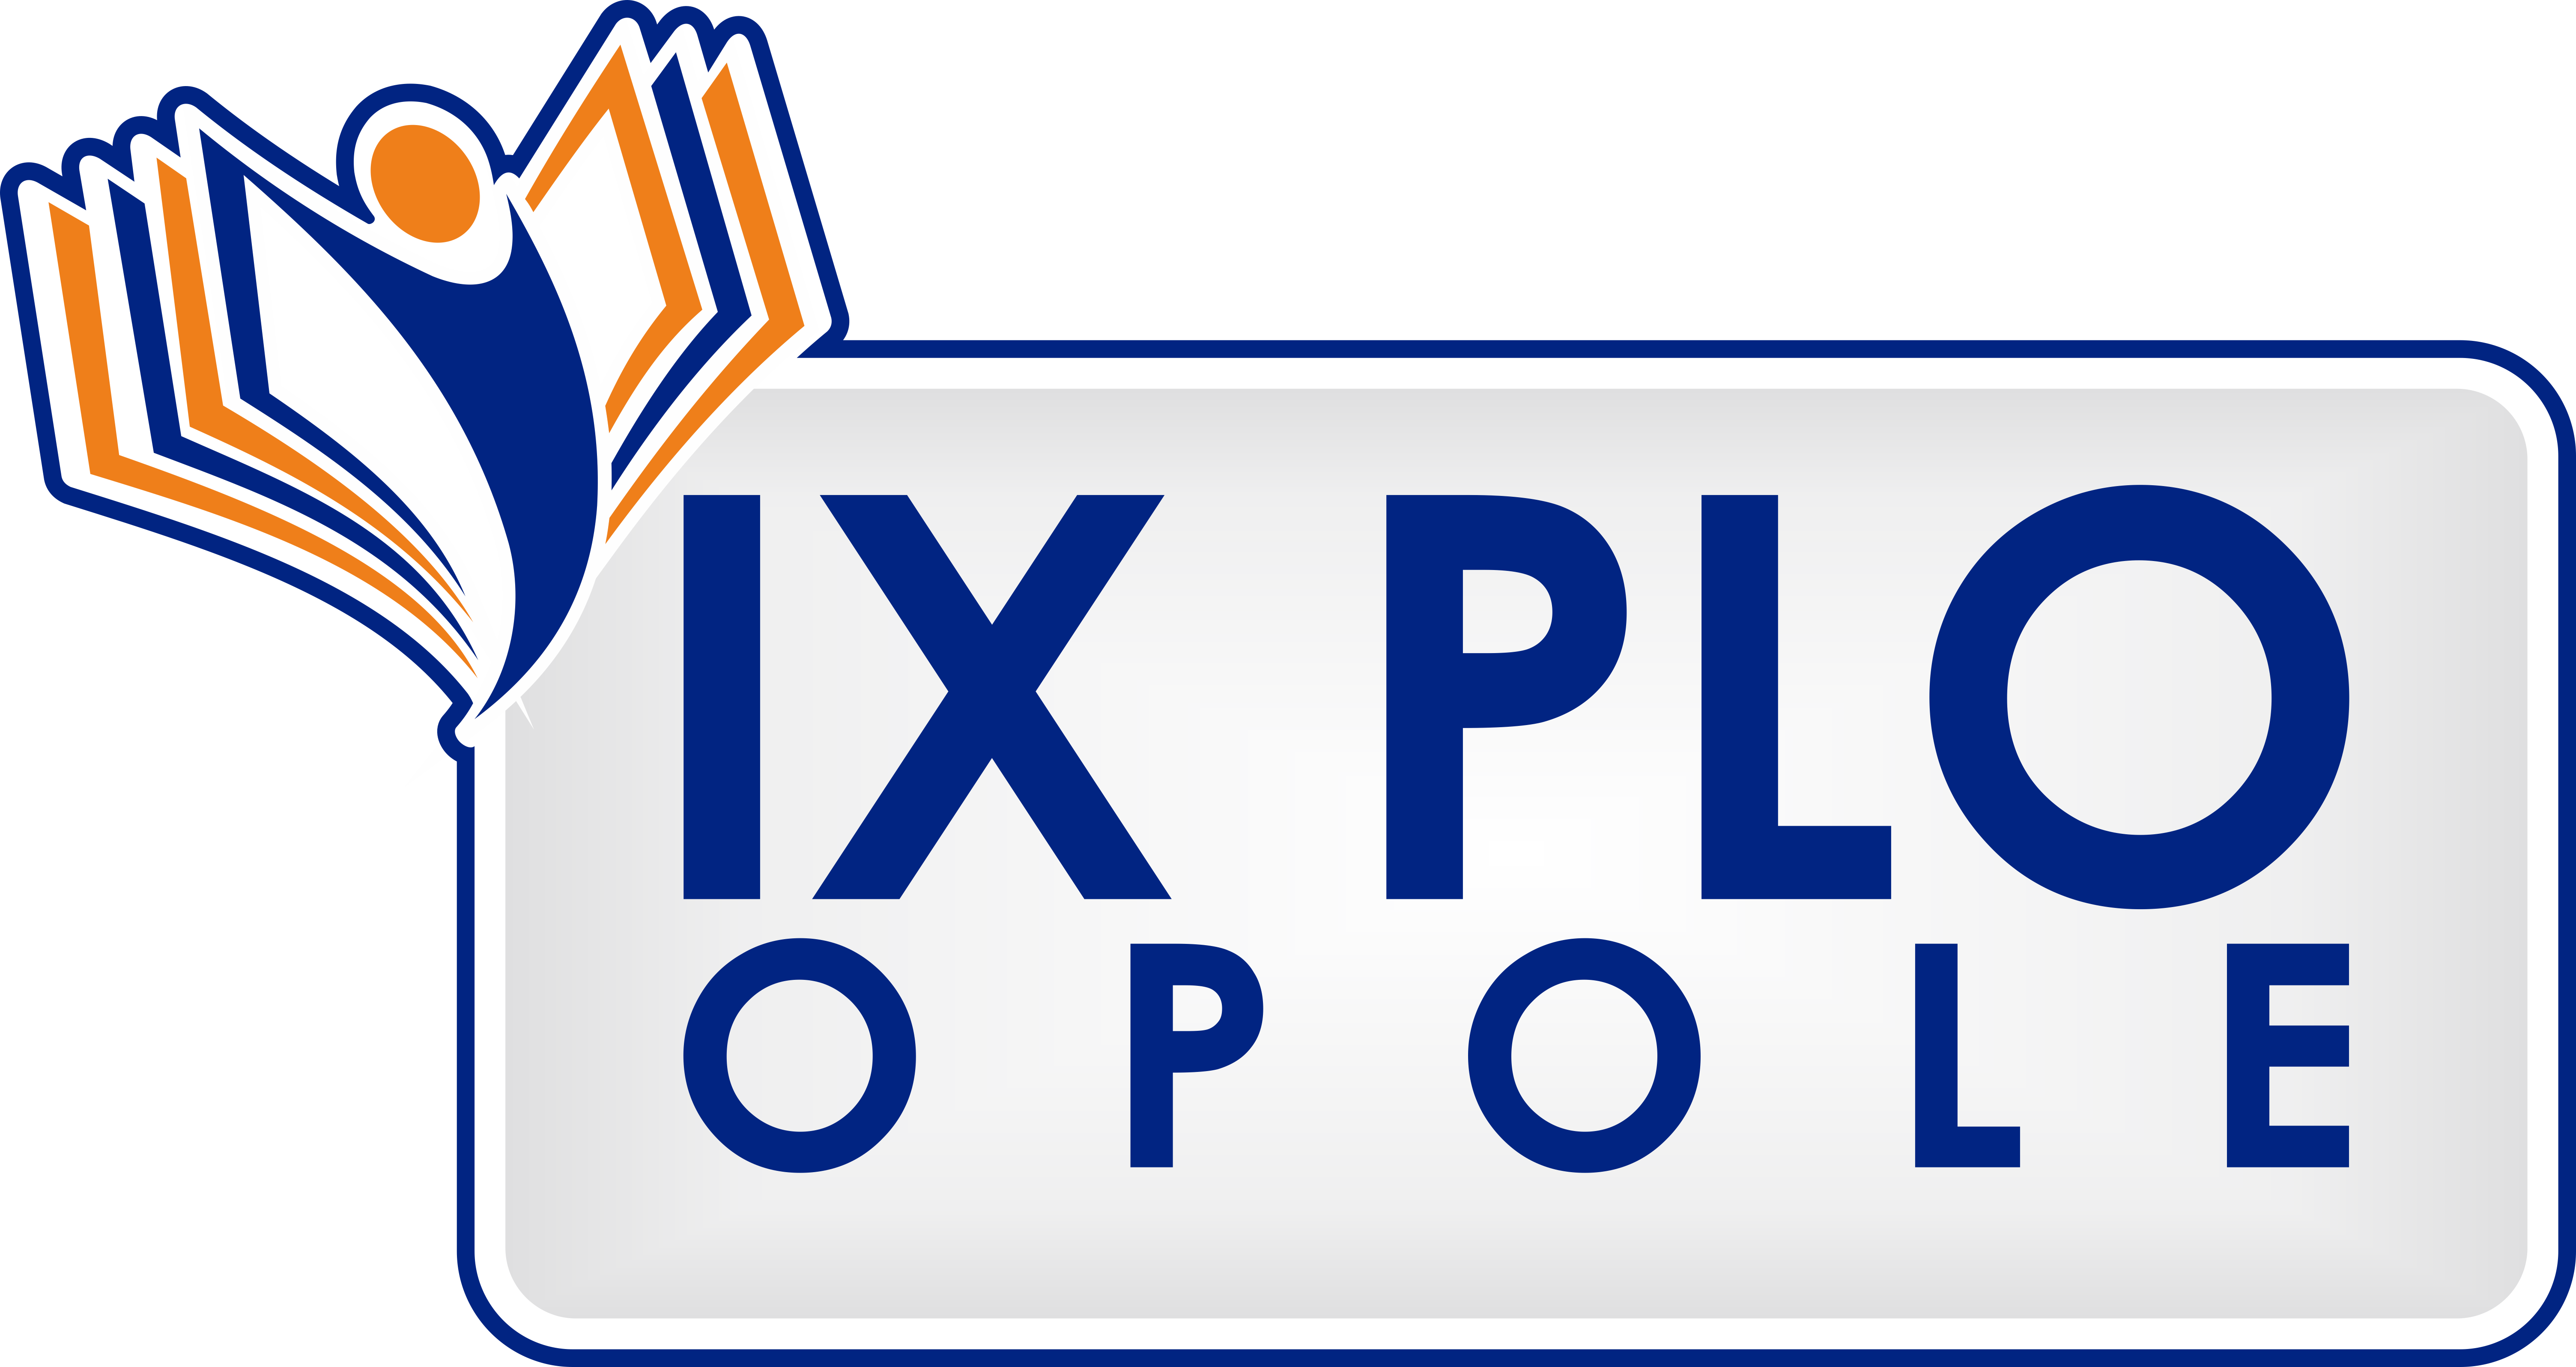 PLO IX Opole